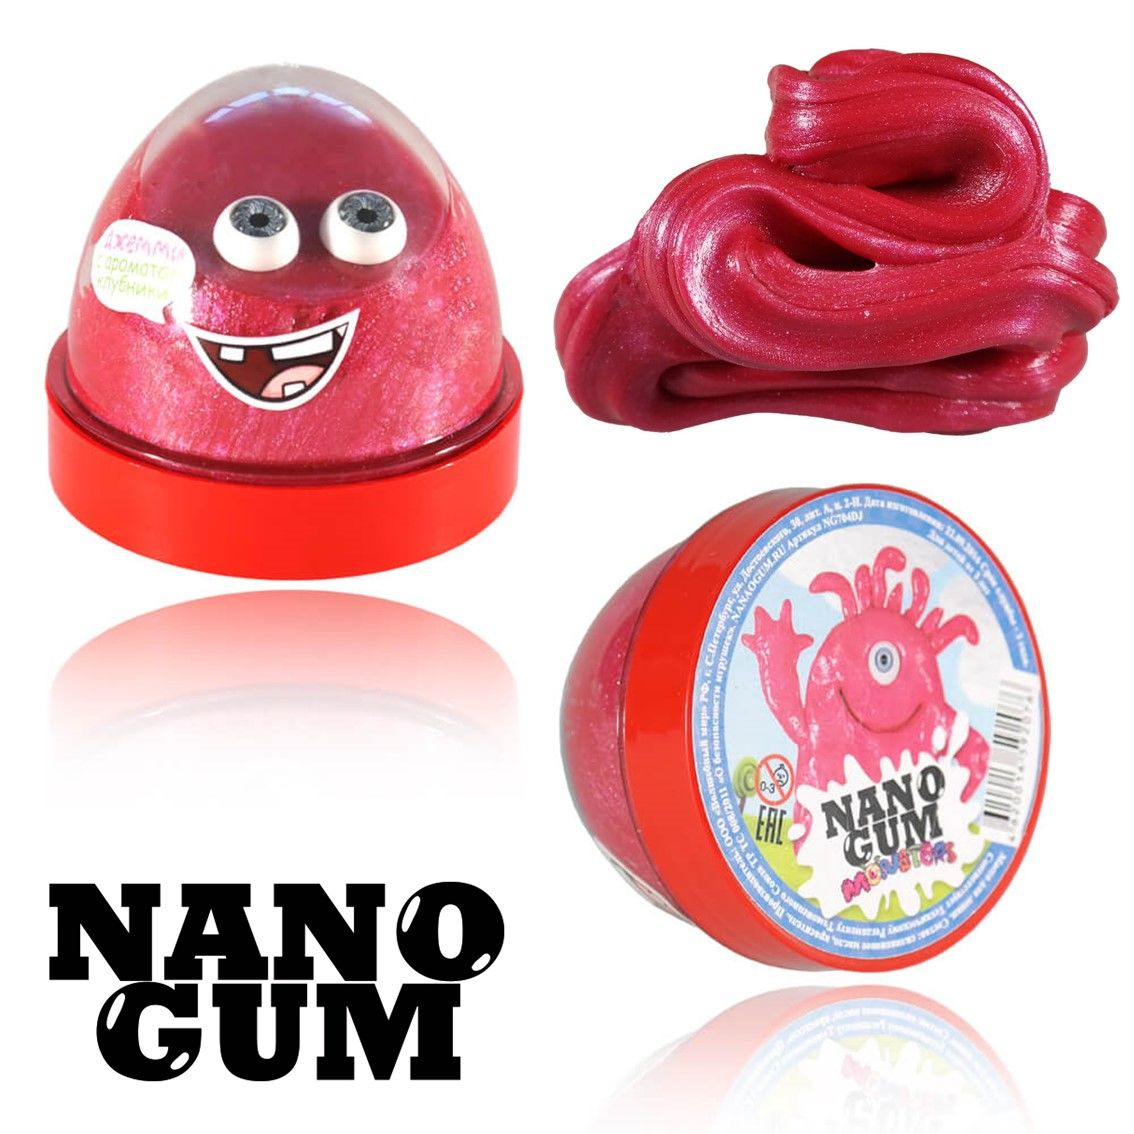 Жвачка для рук Nano gum Джемми 50 гр